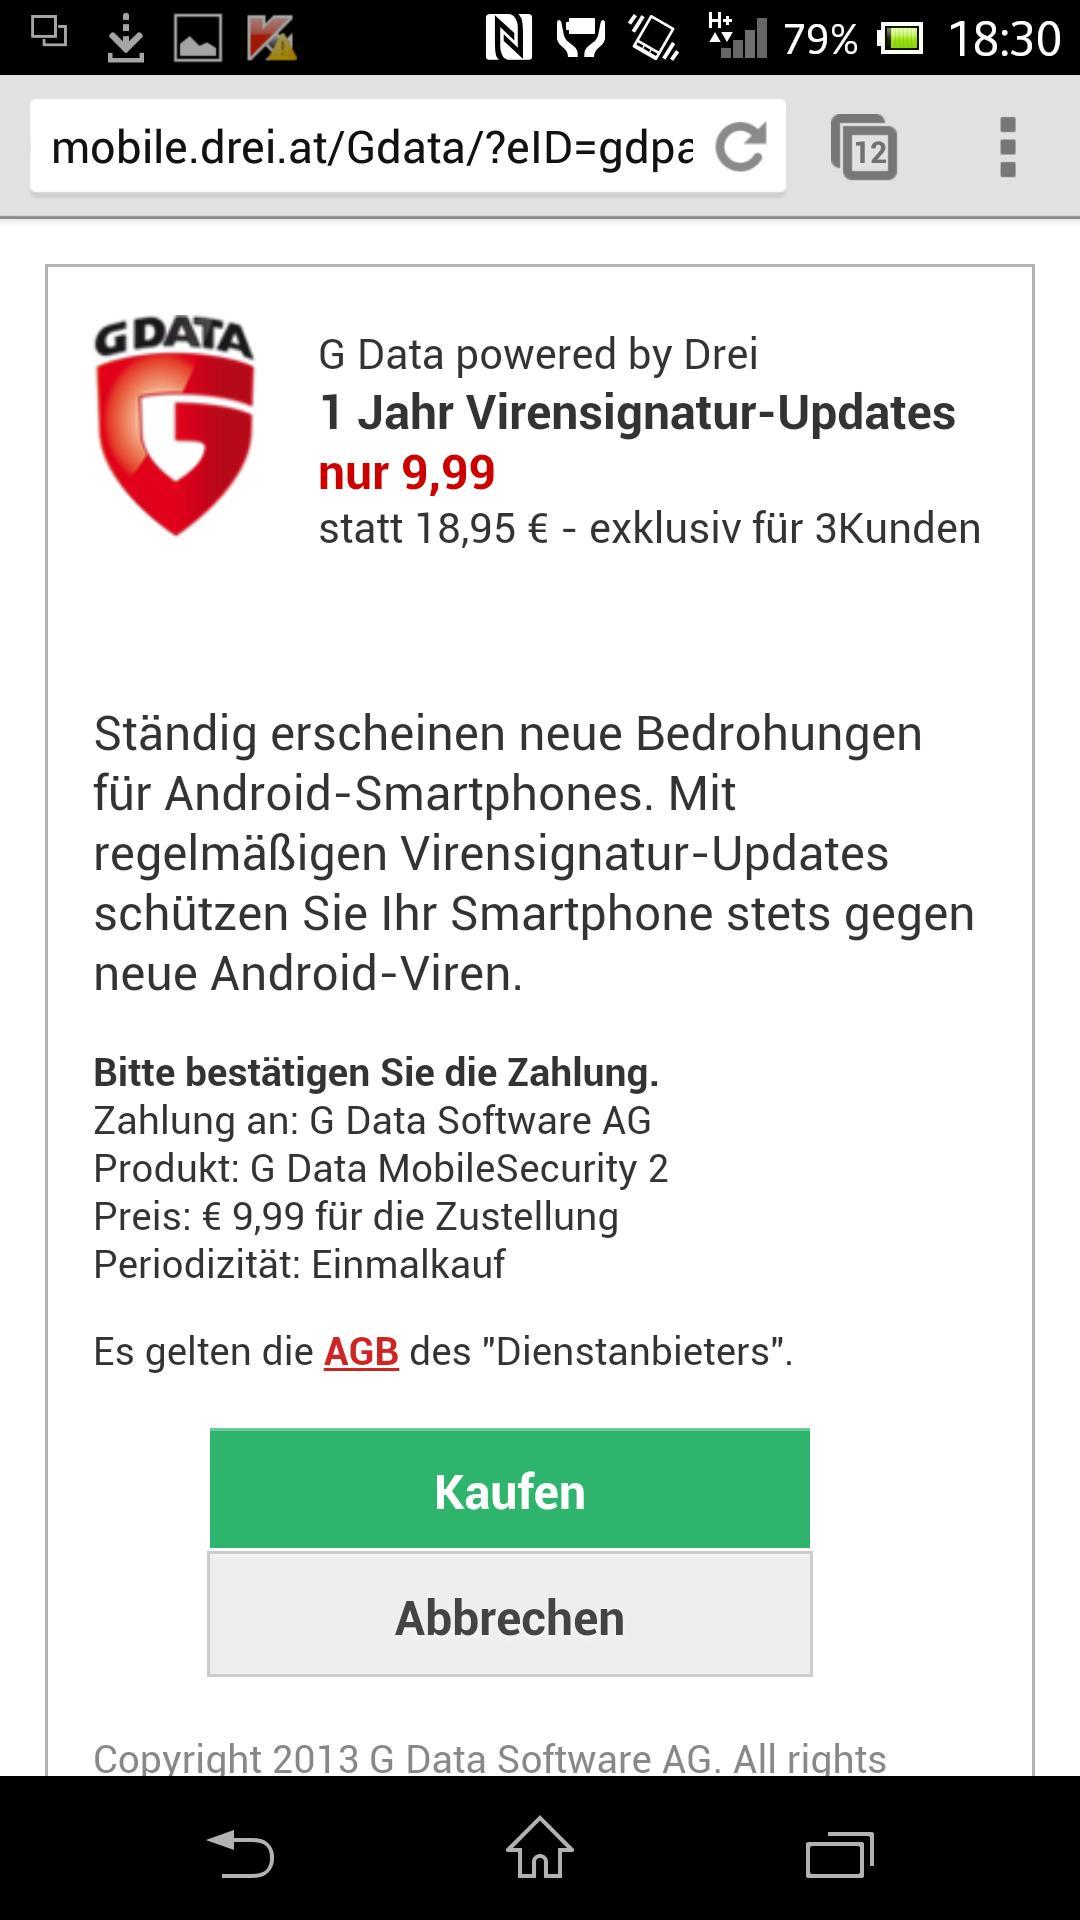 Pcs jahr data android g 2 internet 2 security 1 G Data